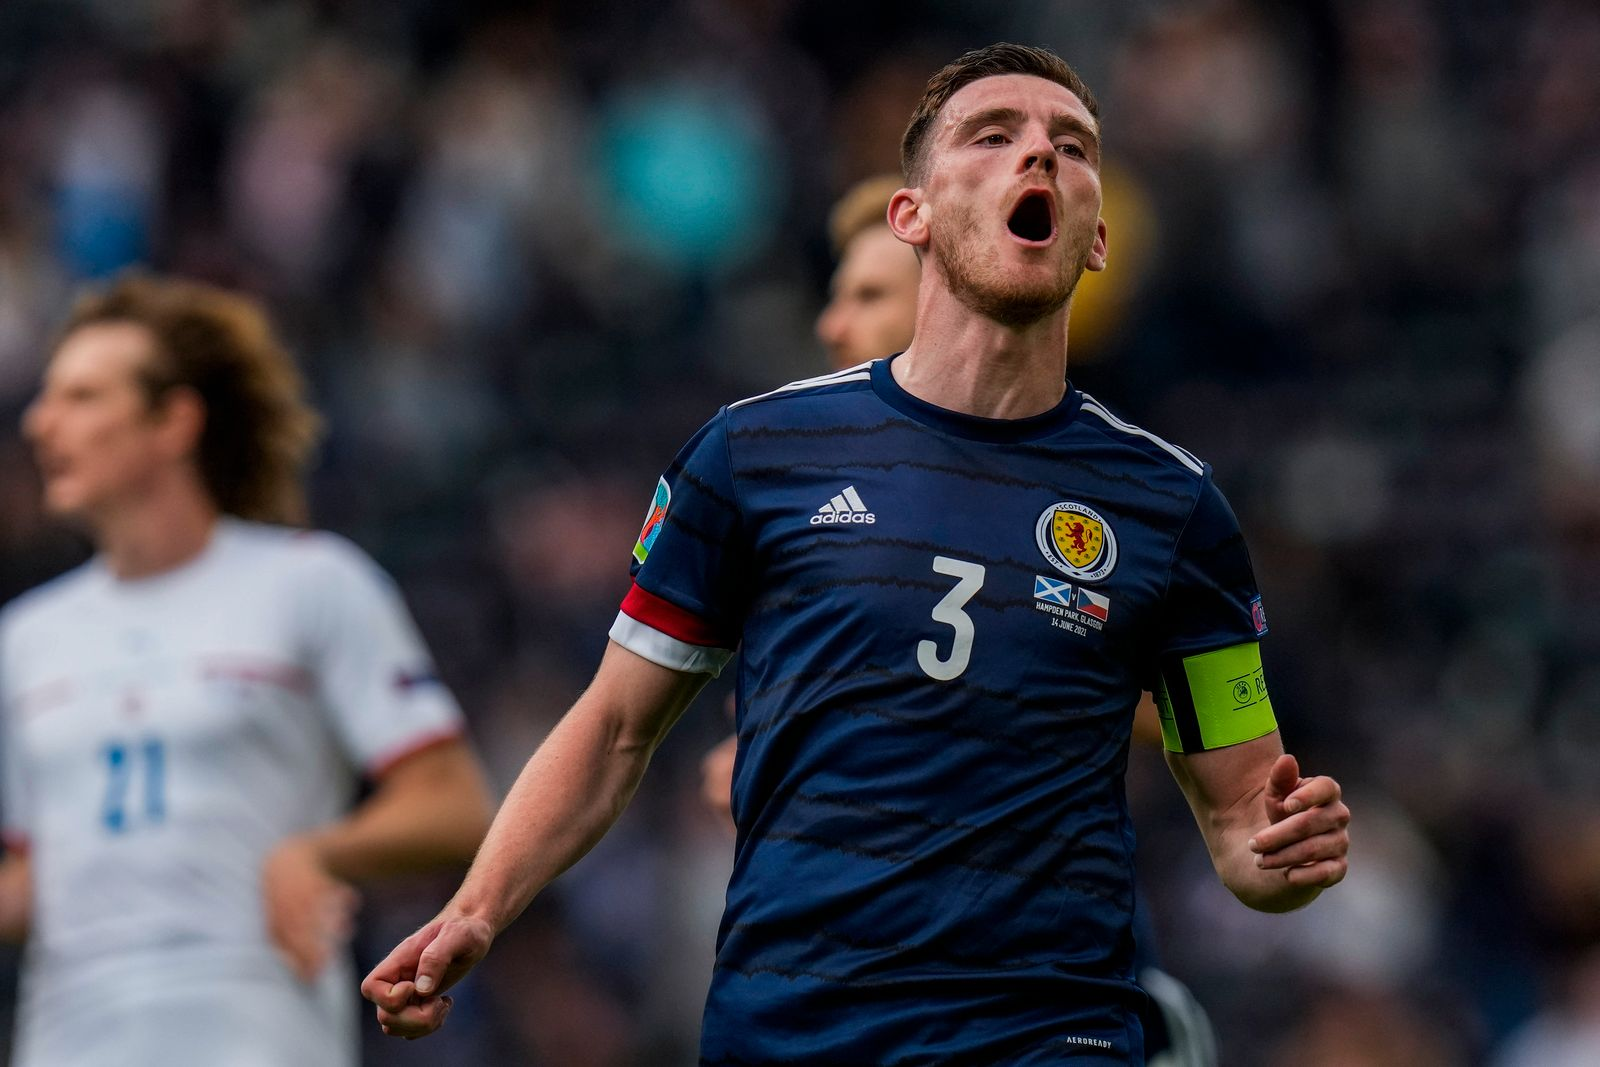 Britain Scotland Czech Republic Euro 2020 Soccer